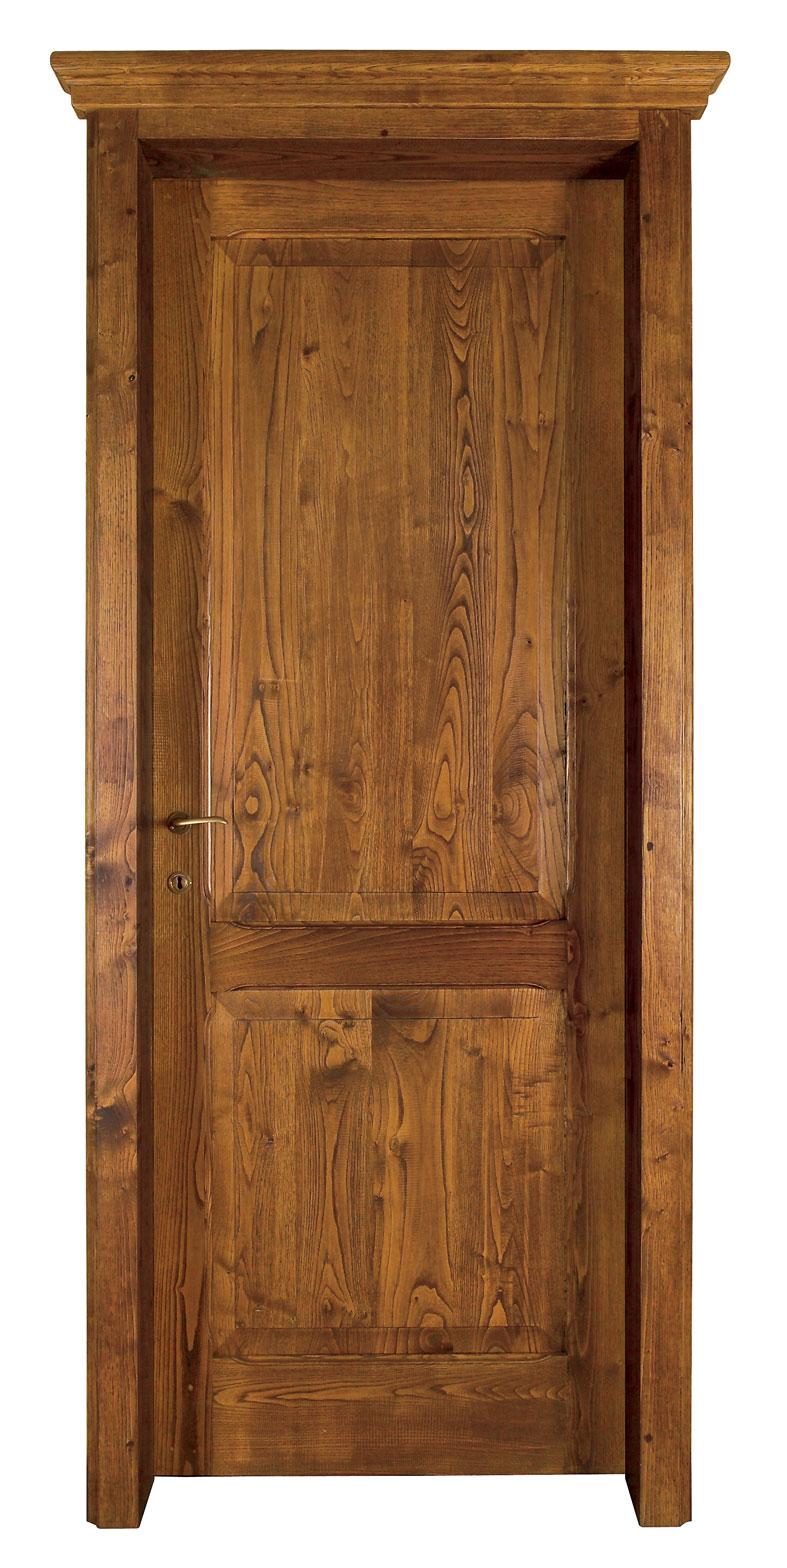 Cmb international srl infissi in legno massello di castagno porta 953 wood - Porta in legno massello ...